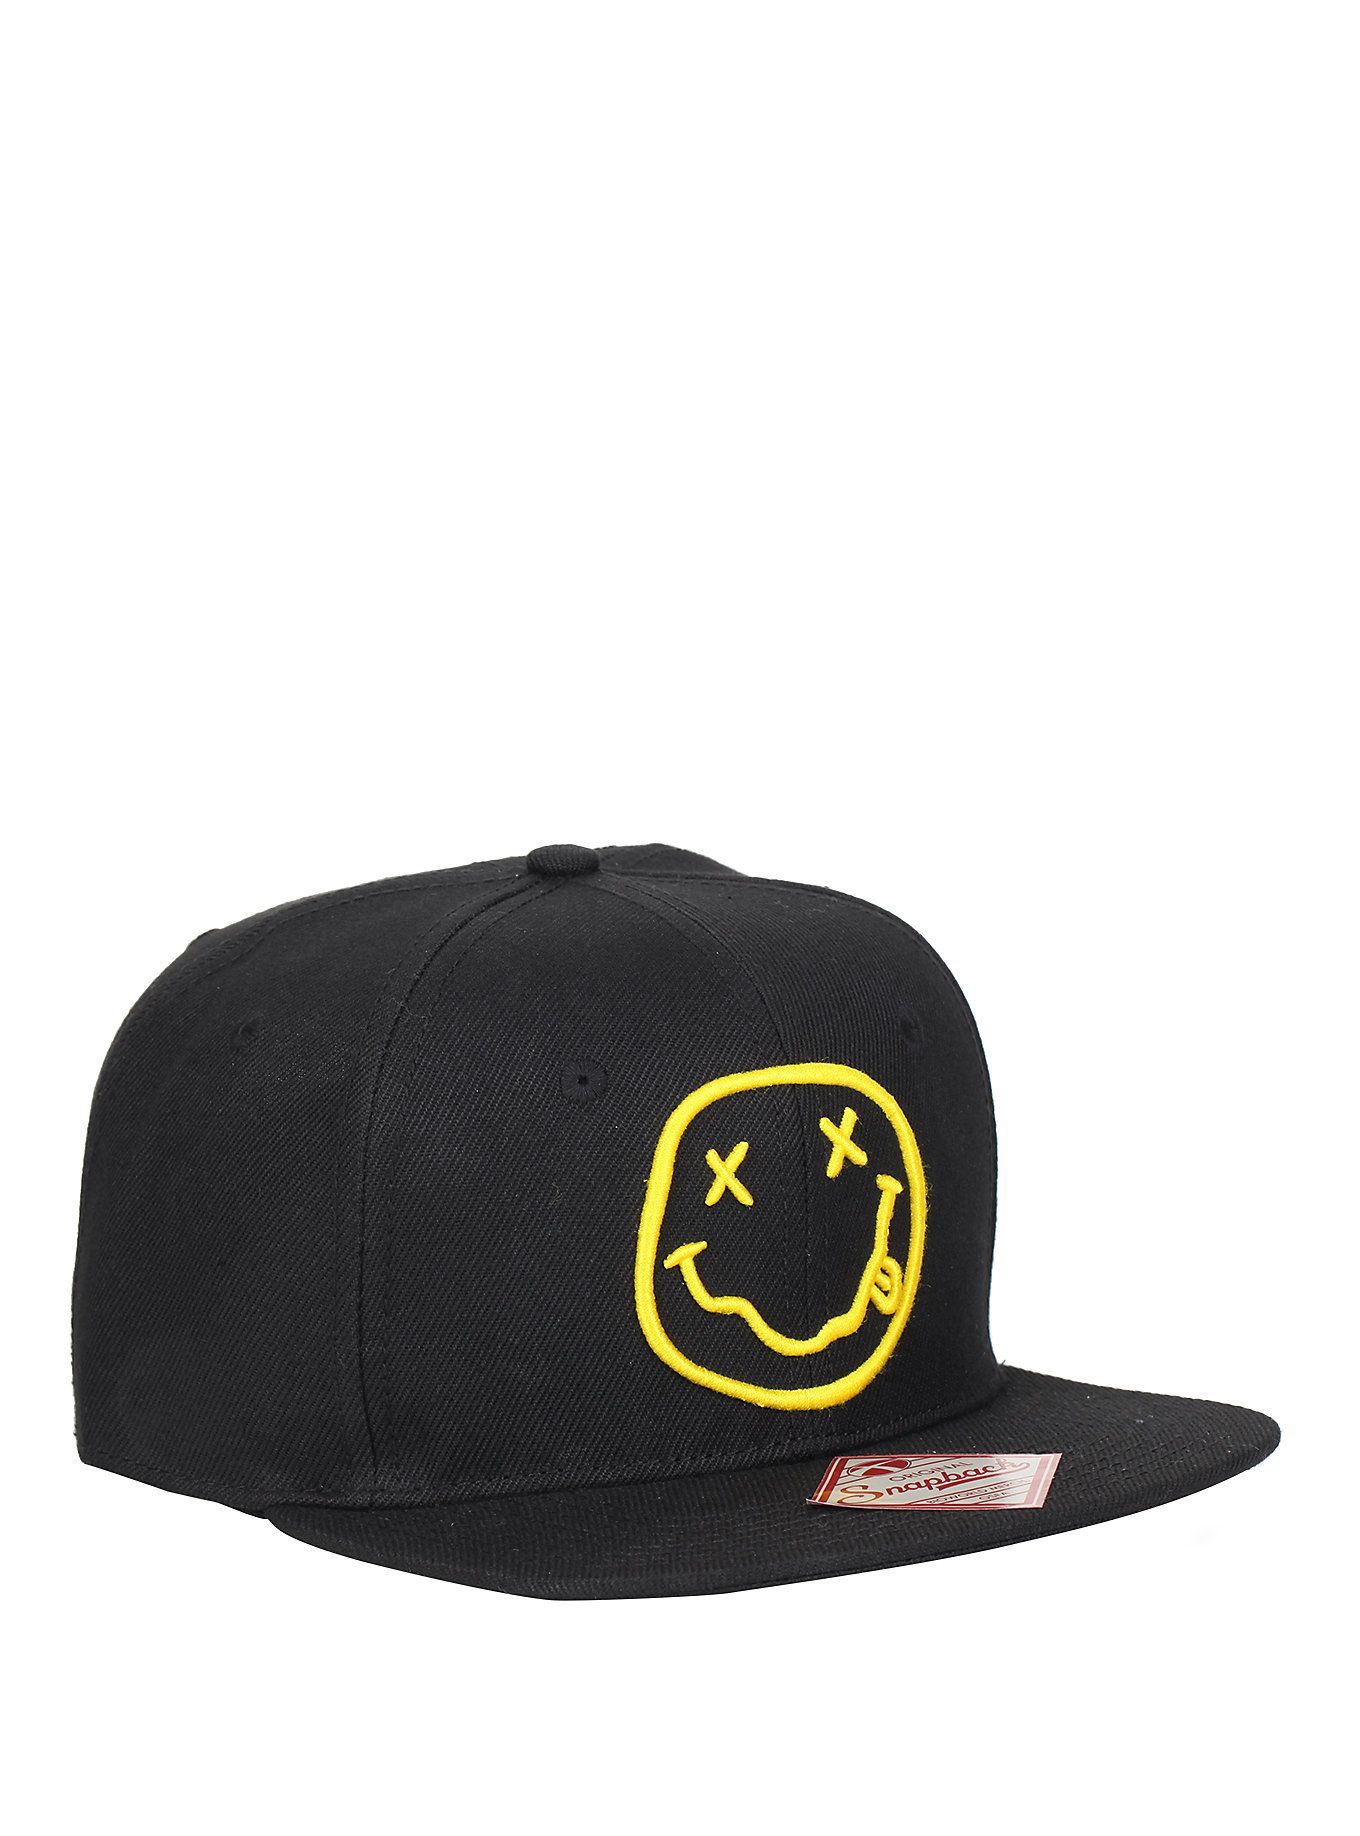 Official Nirvana Smiley Logo Black Baseball Cap Hat One Size Unisex Music Merch